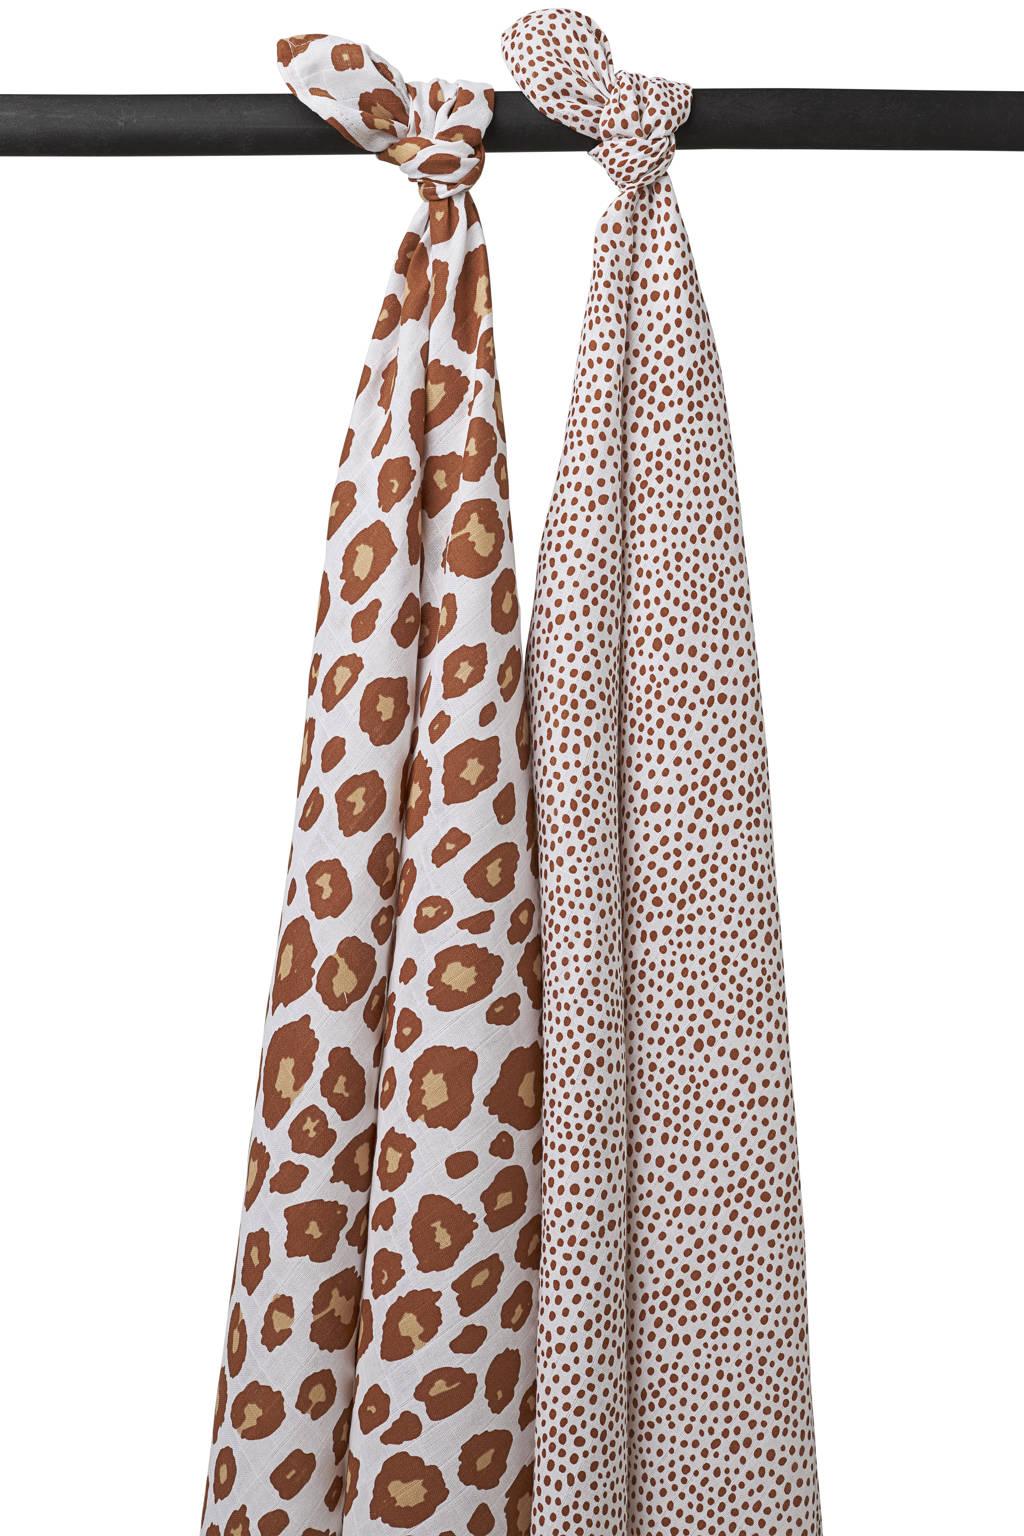 Meyco hydrofiele luier - set van 2 120x120 cm Panter-Cheetah camel, Camel/wit/oker